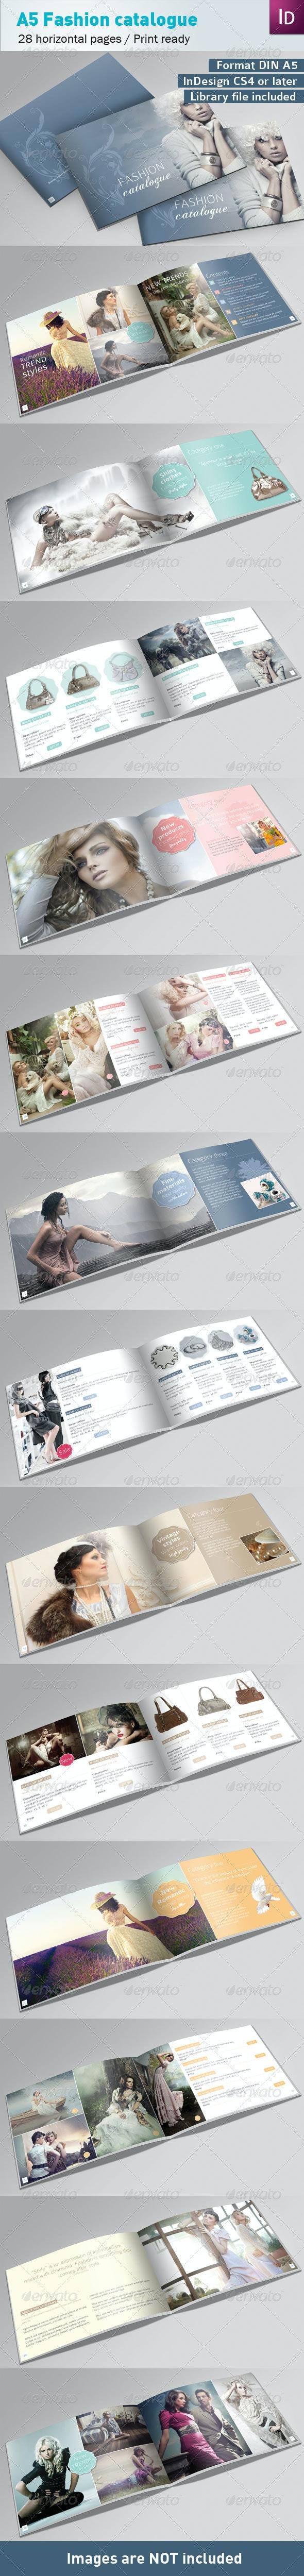 Fashion Catalogue A5 - Catalogs Brochures